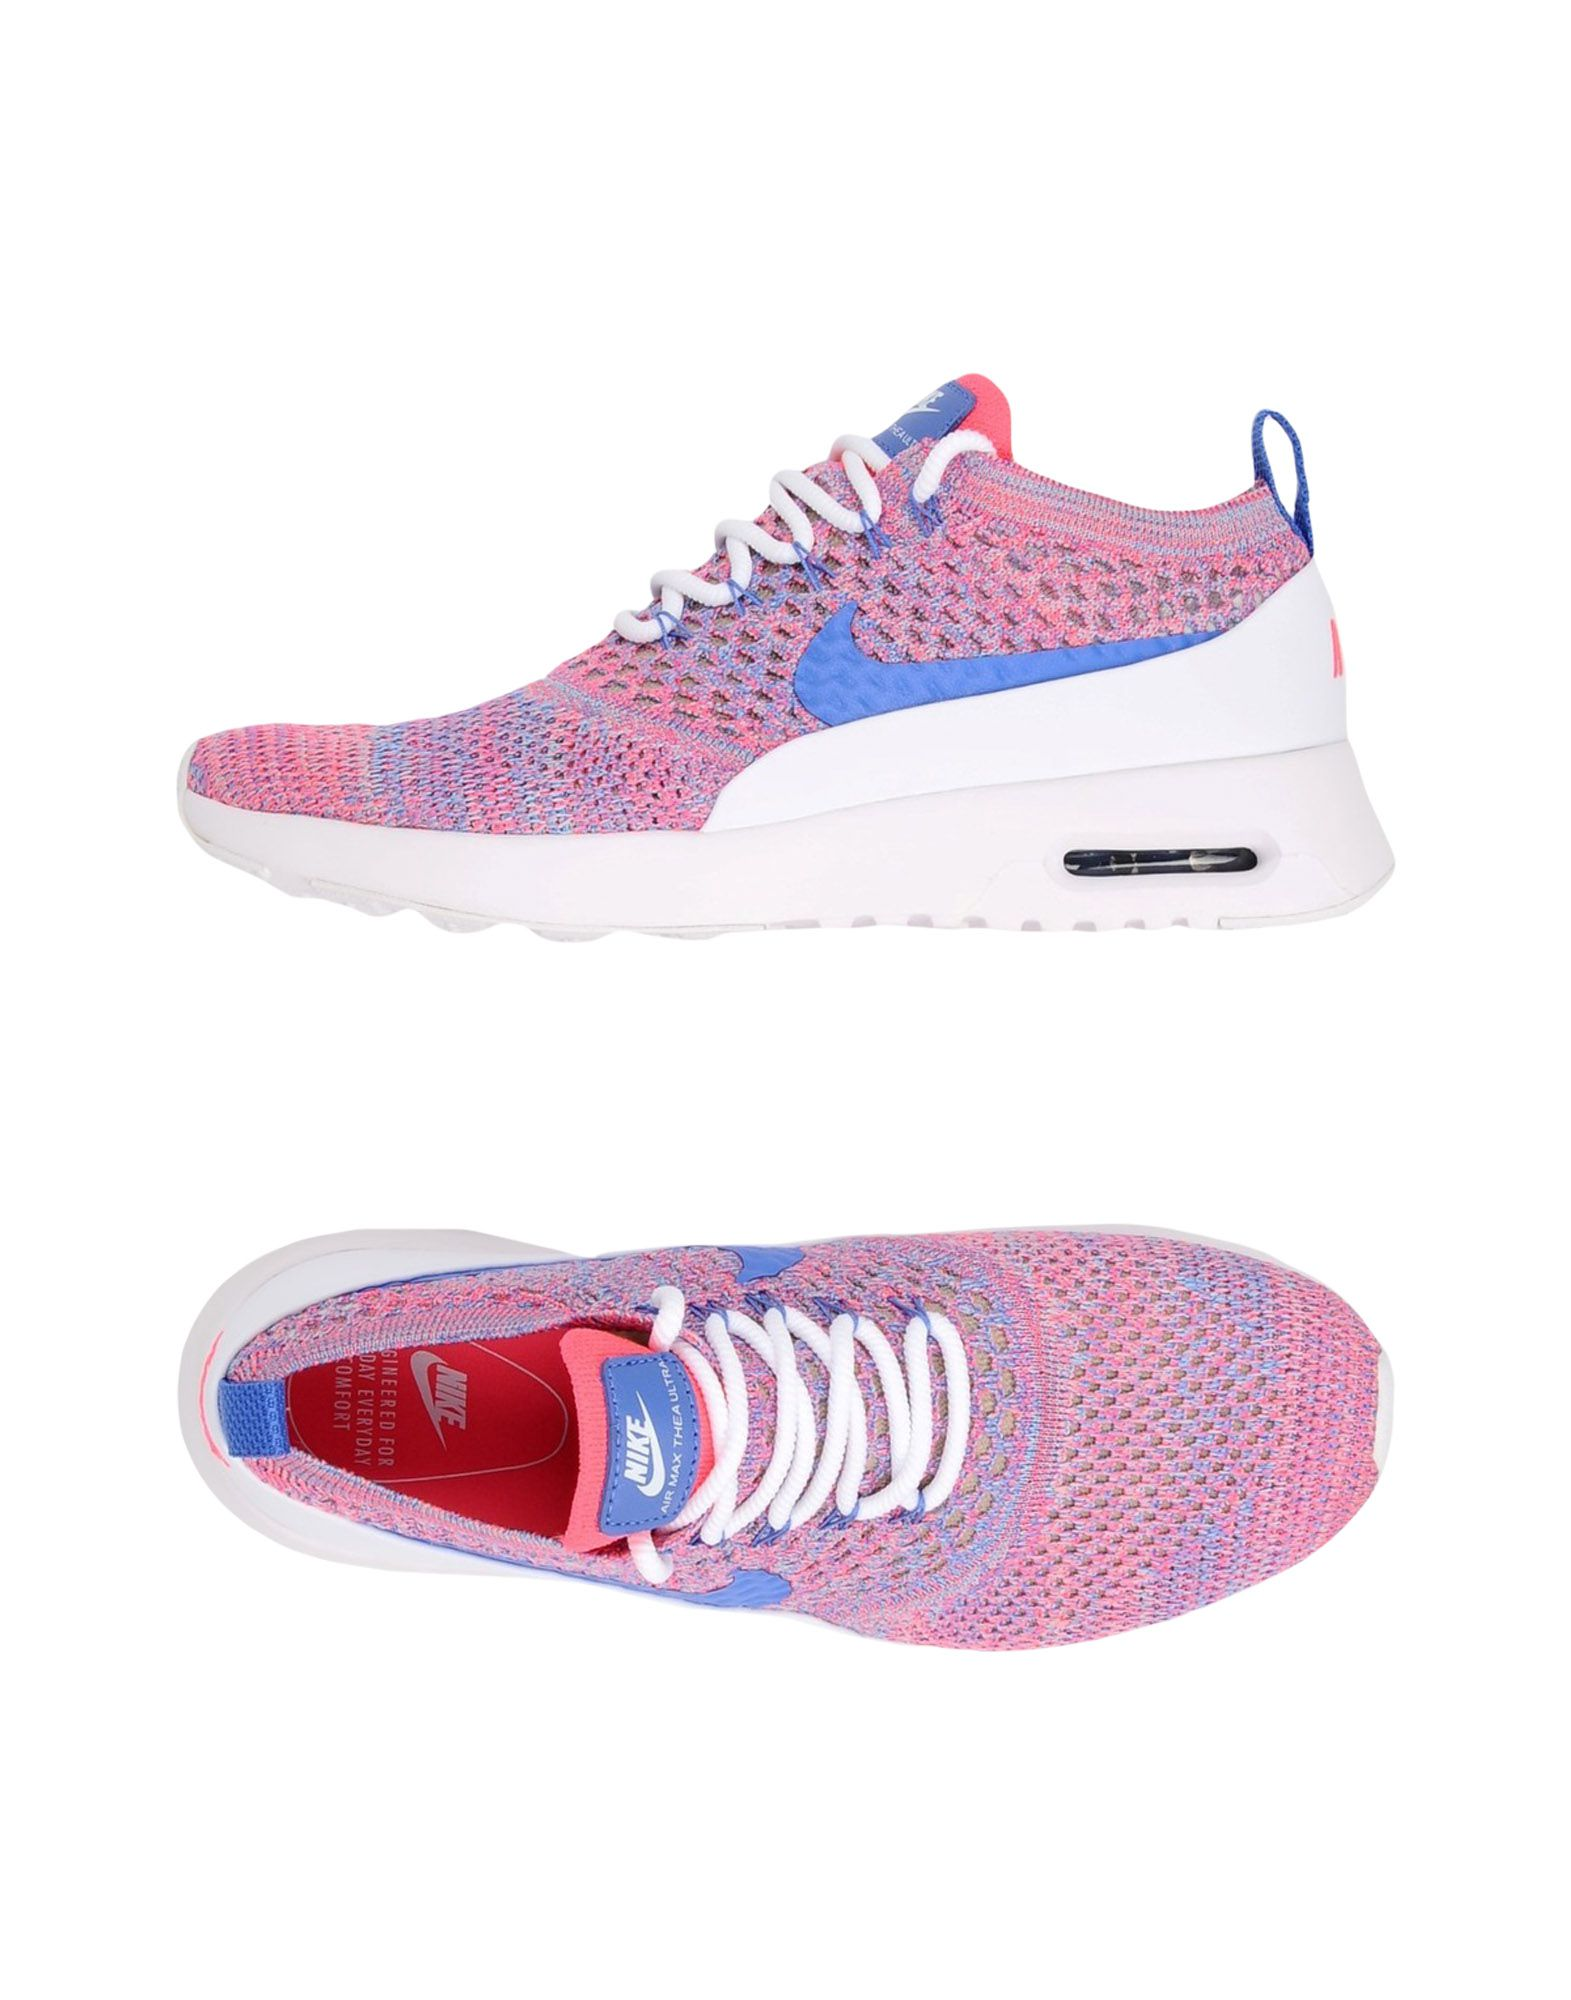 Nike   Air Max Thea Ultra Fk  11292345GA Gute Qualität beliebte Schuhe